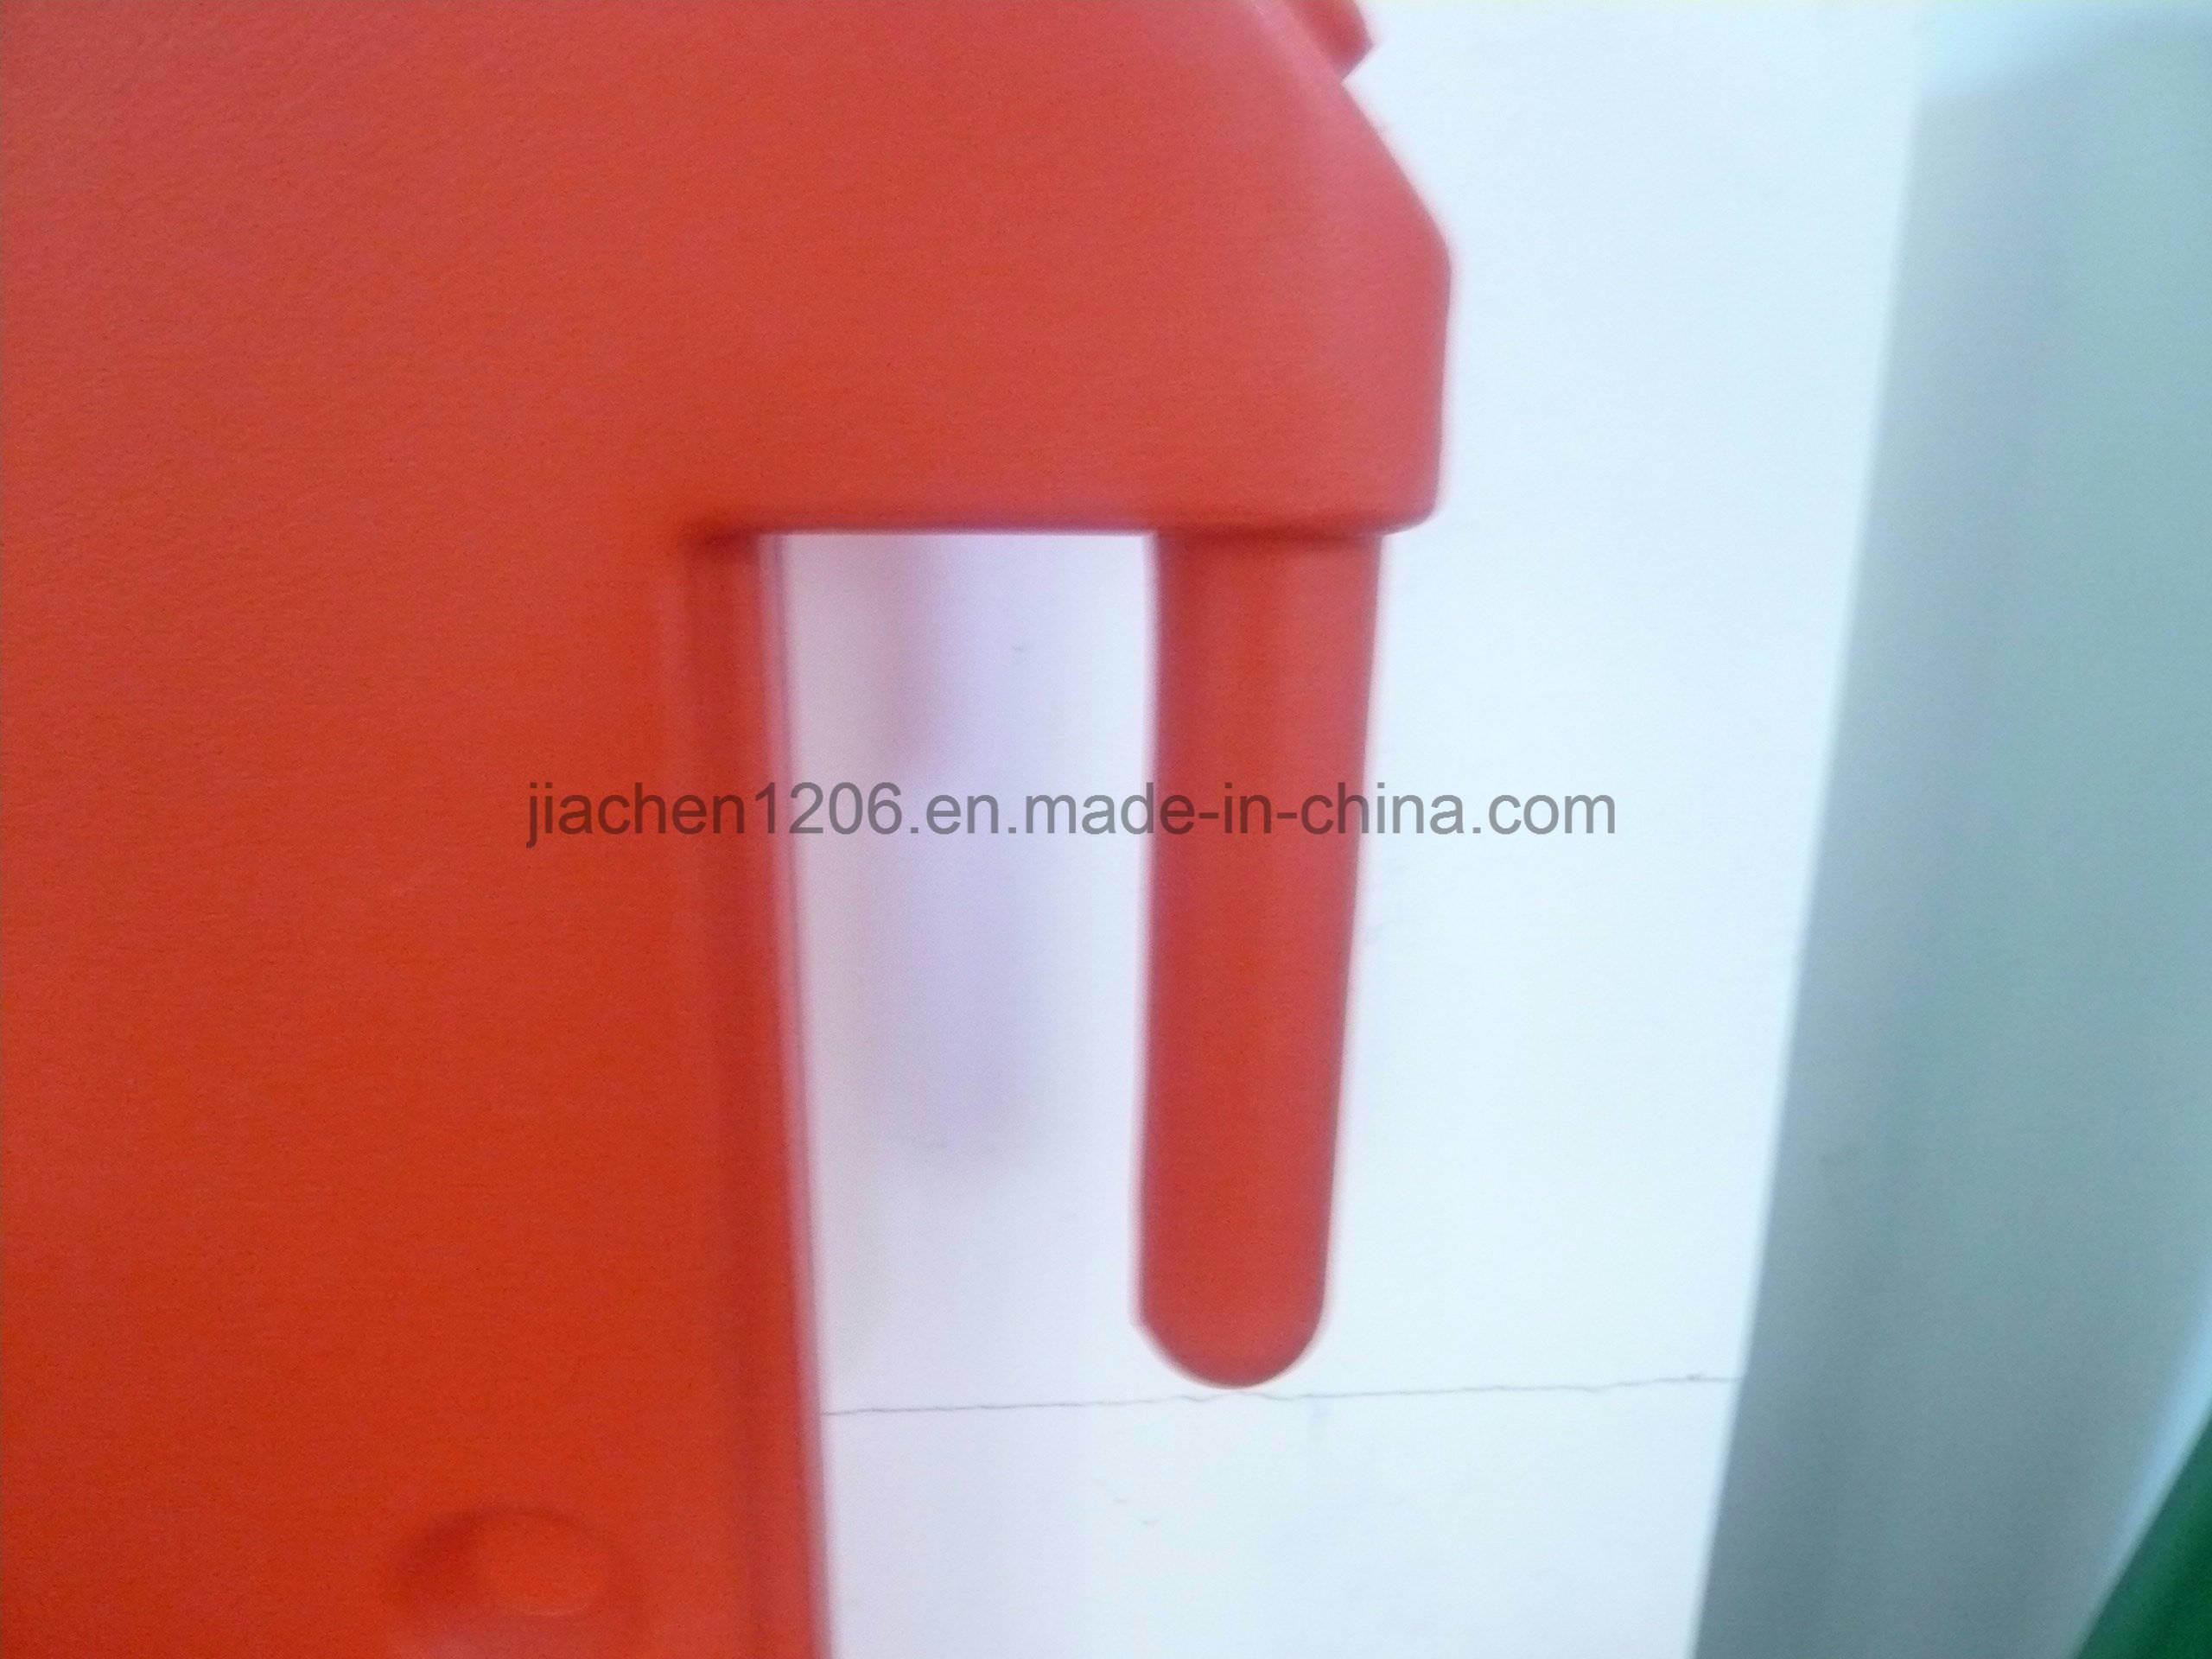 Interlocking Superior Quality Traffic Safety Plastic Traffic Barricade for Sale